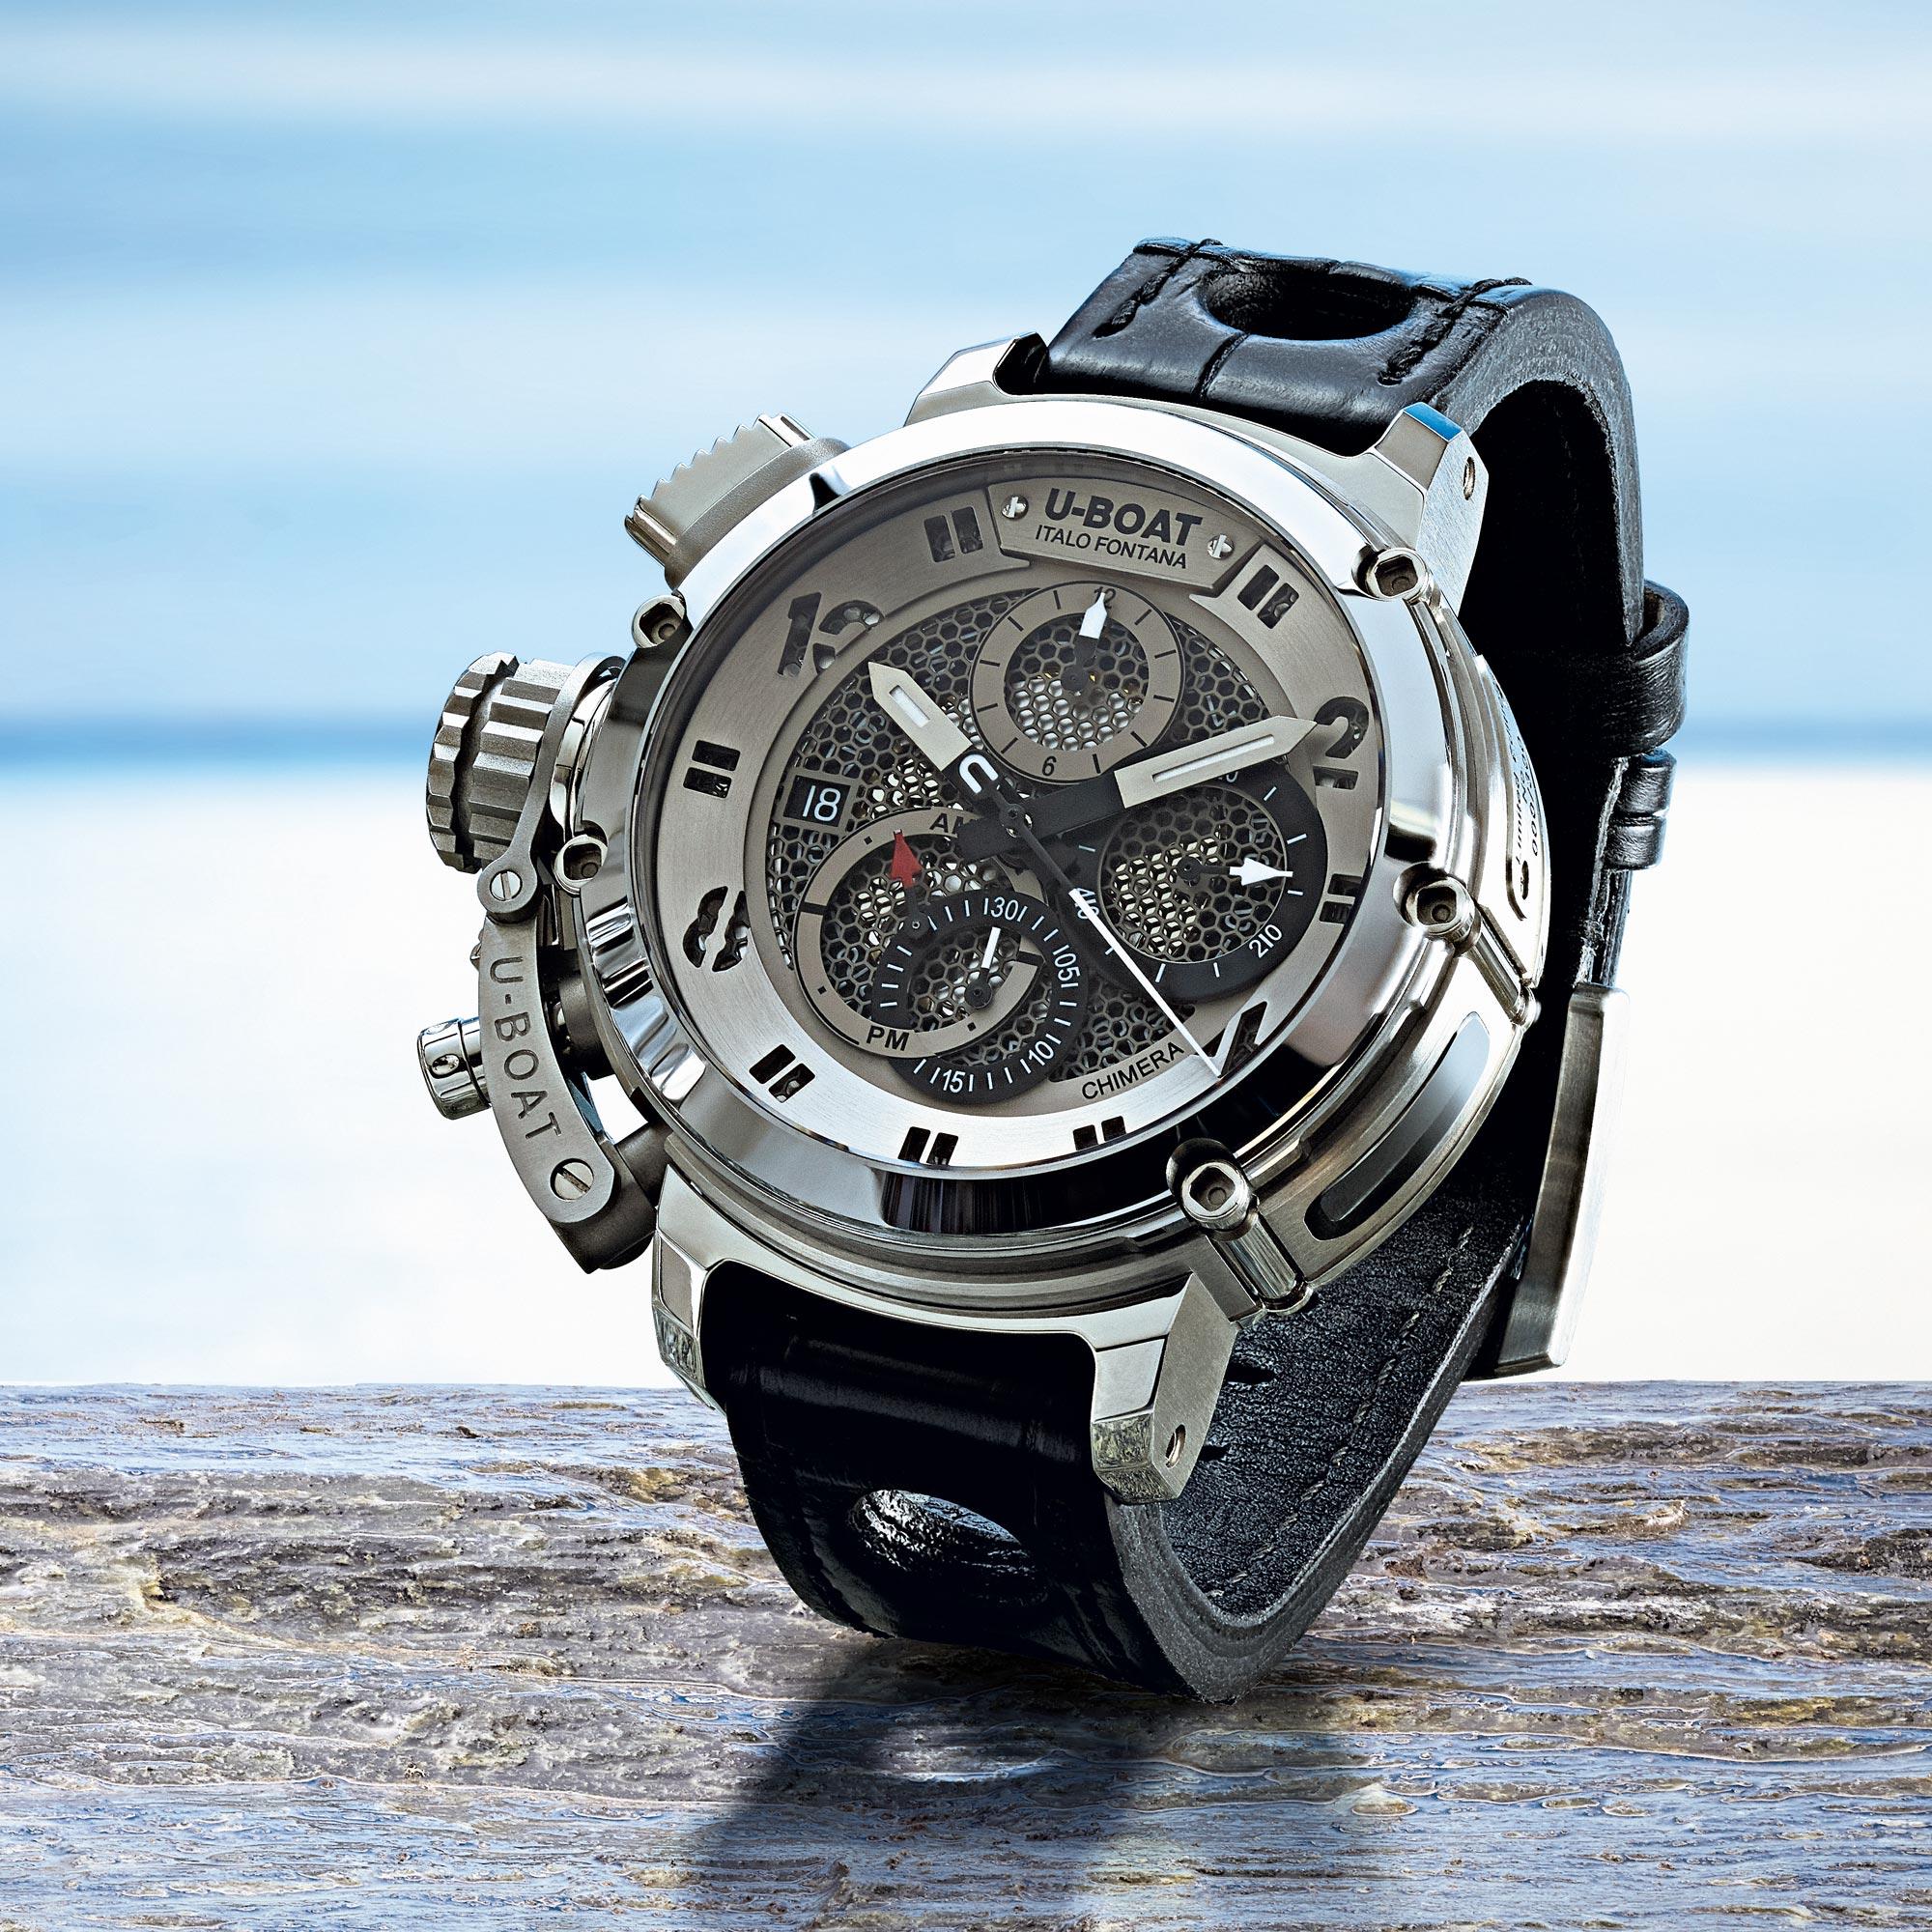 rugged regatta rug elite nardin ulysse chronograph manufacture top archives marine category watches traveler